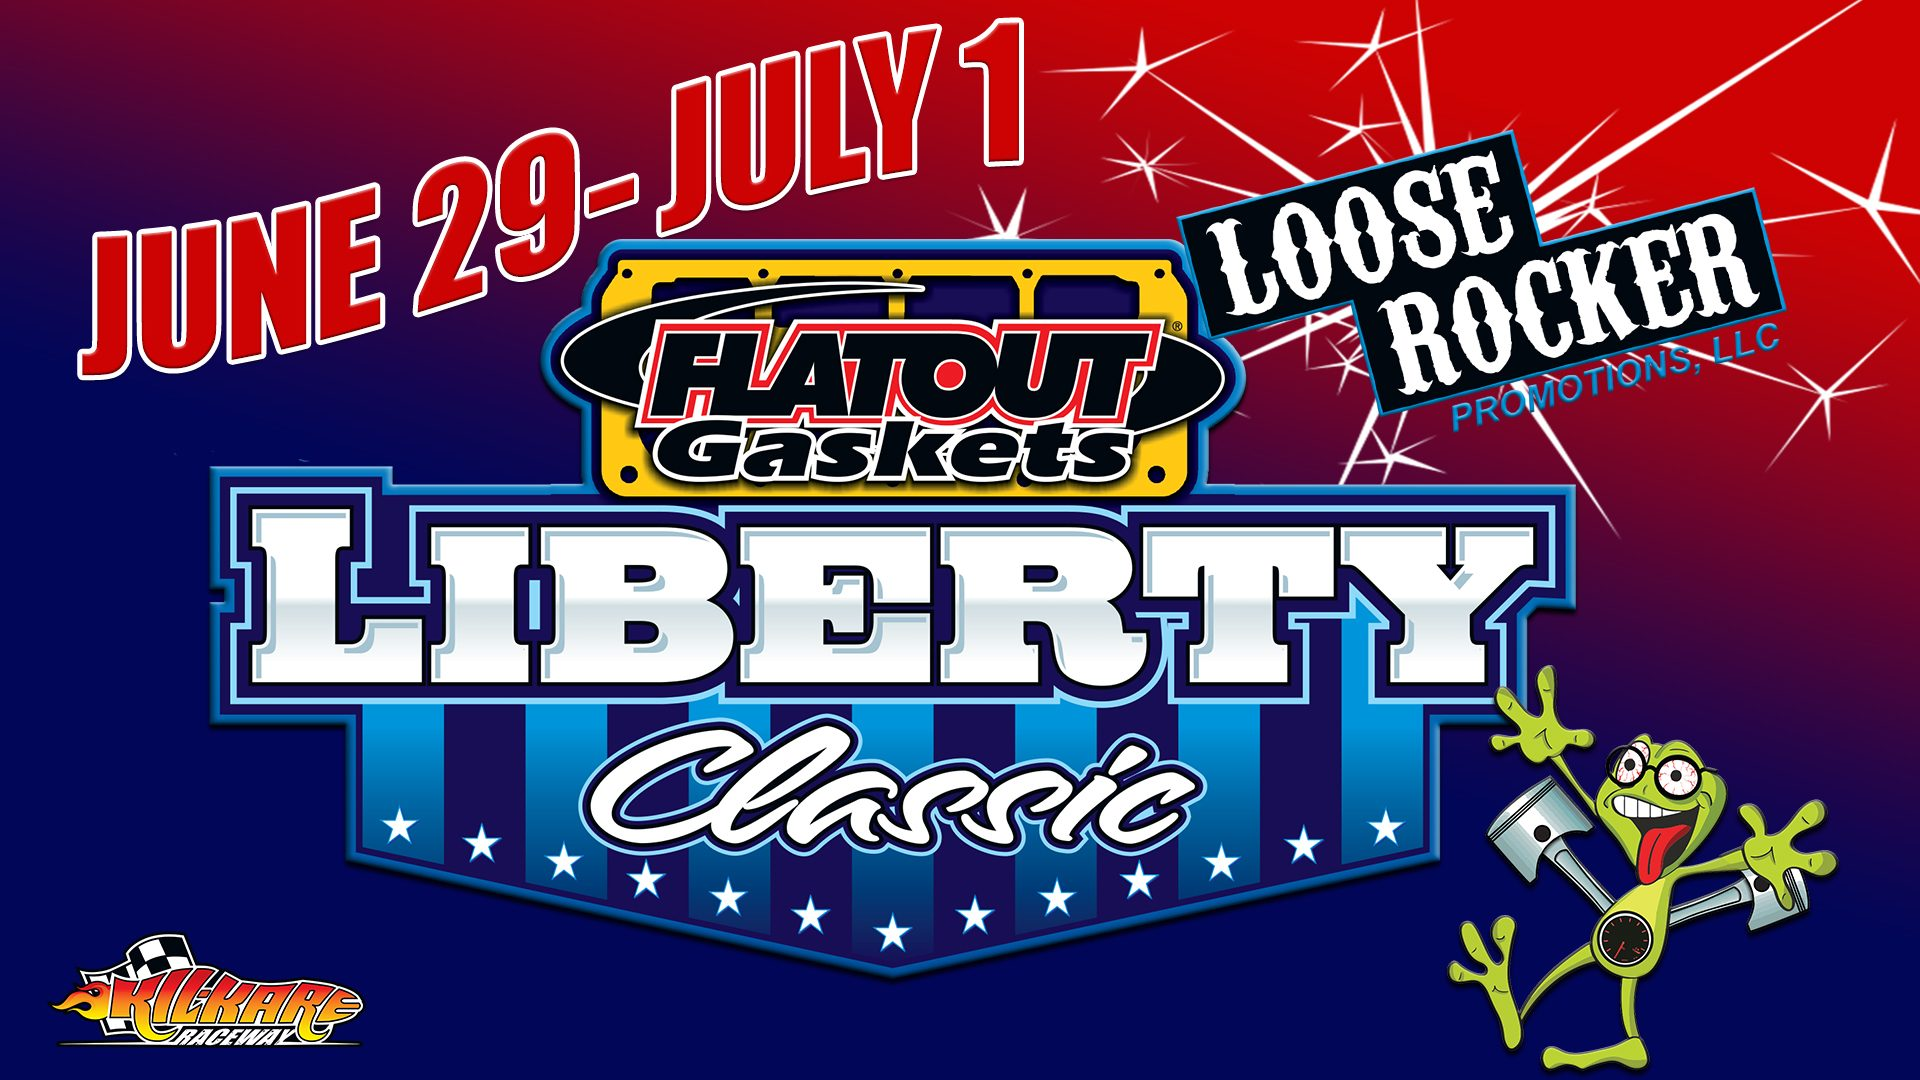 June29-July1_LibertyClassic2018_Wps3